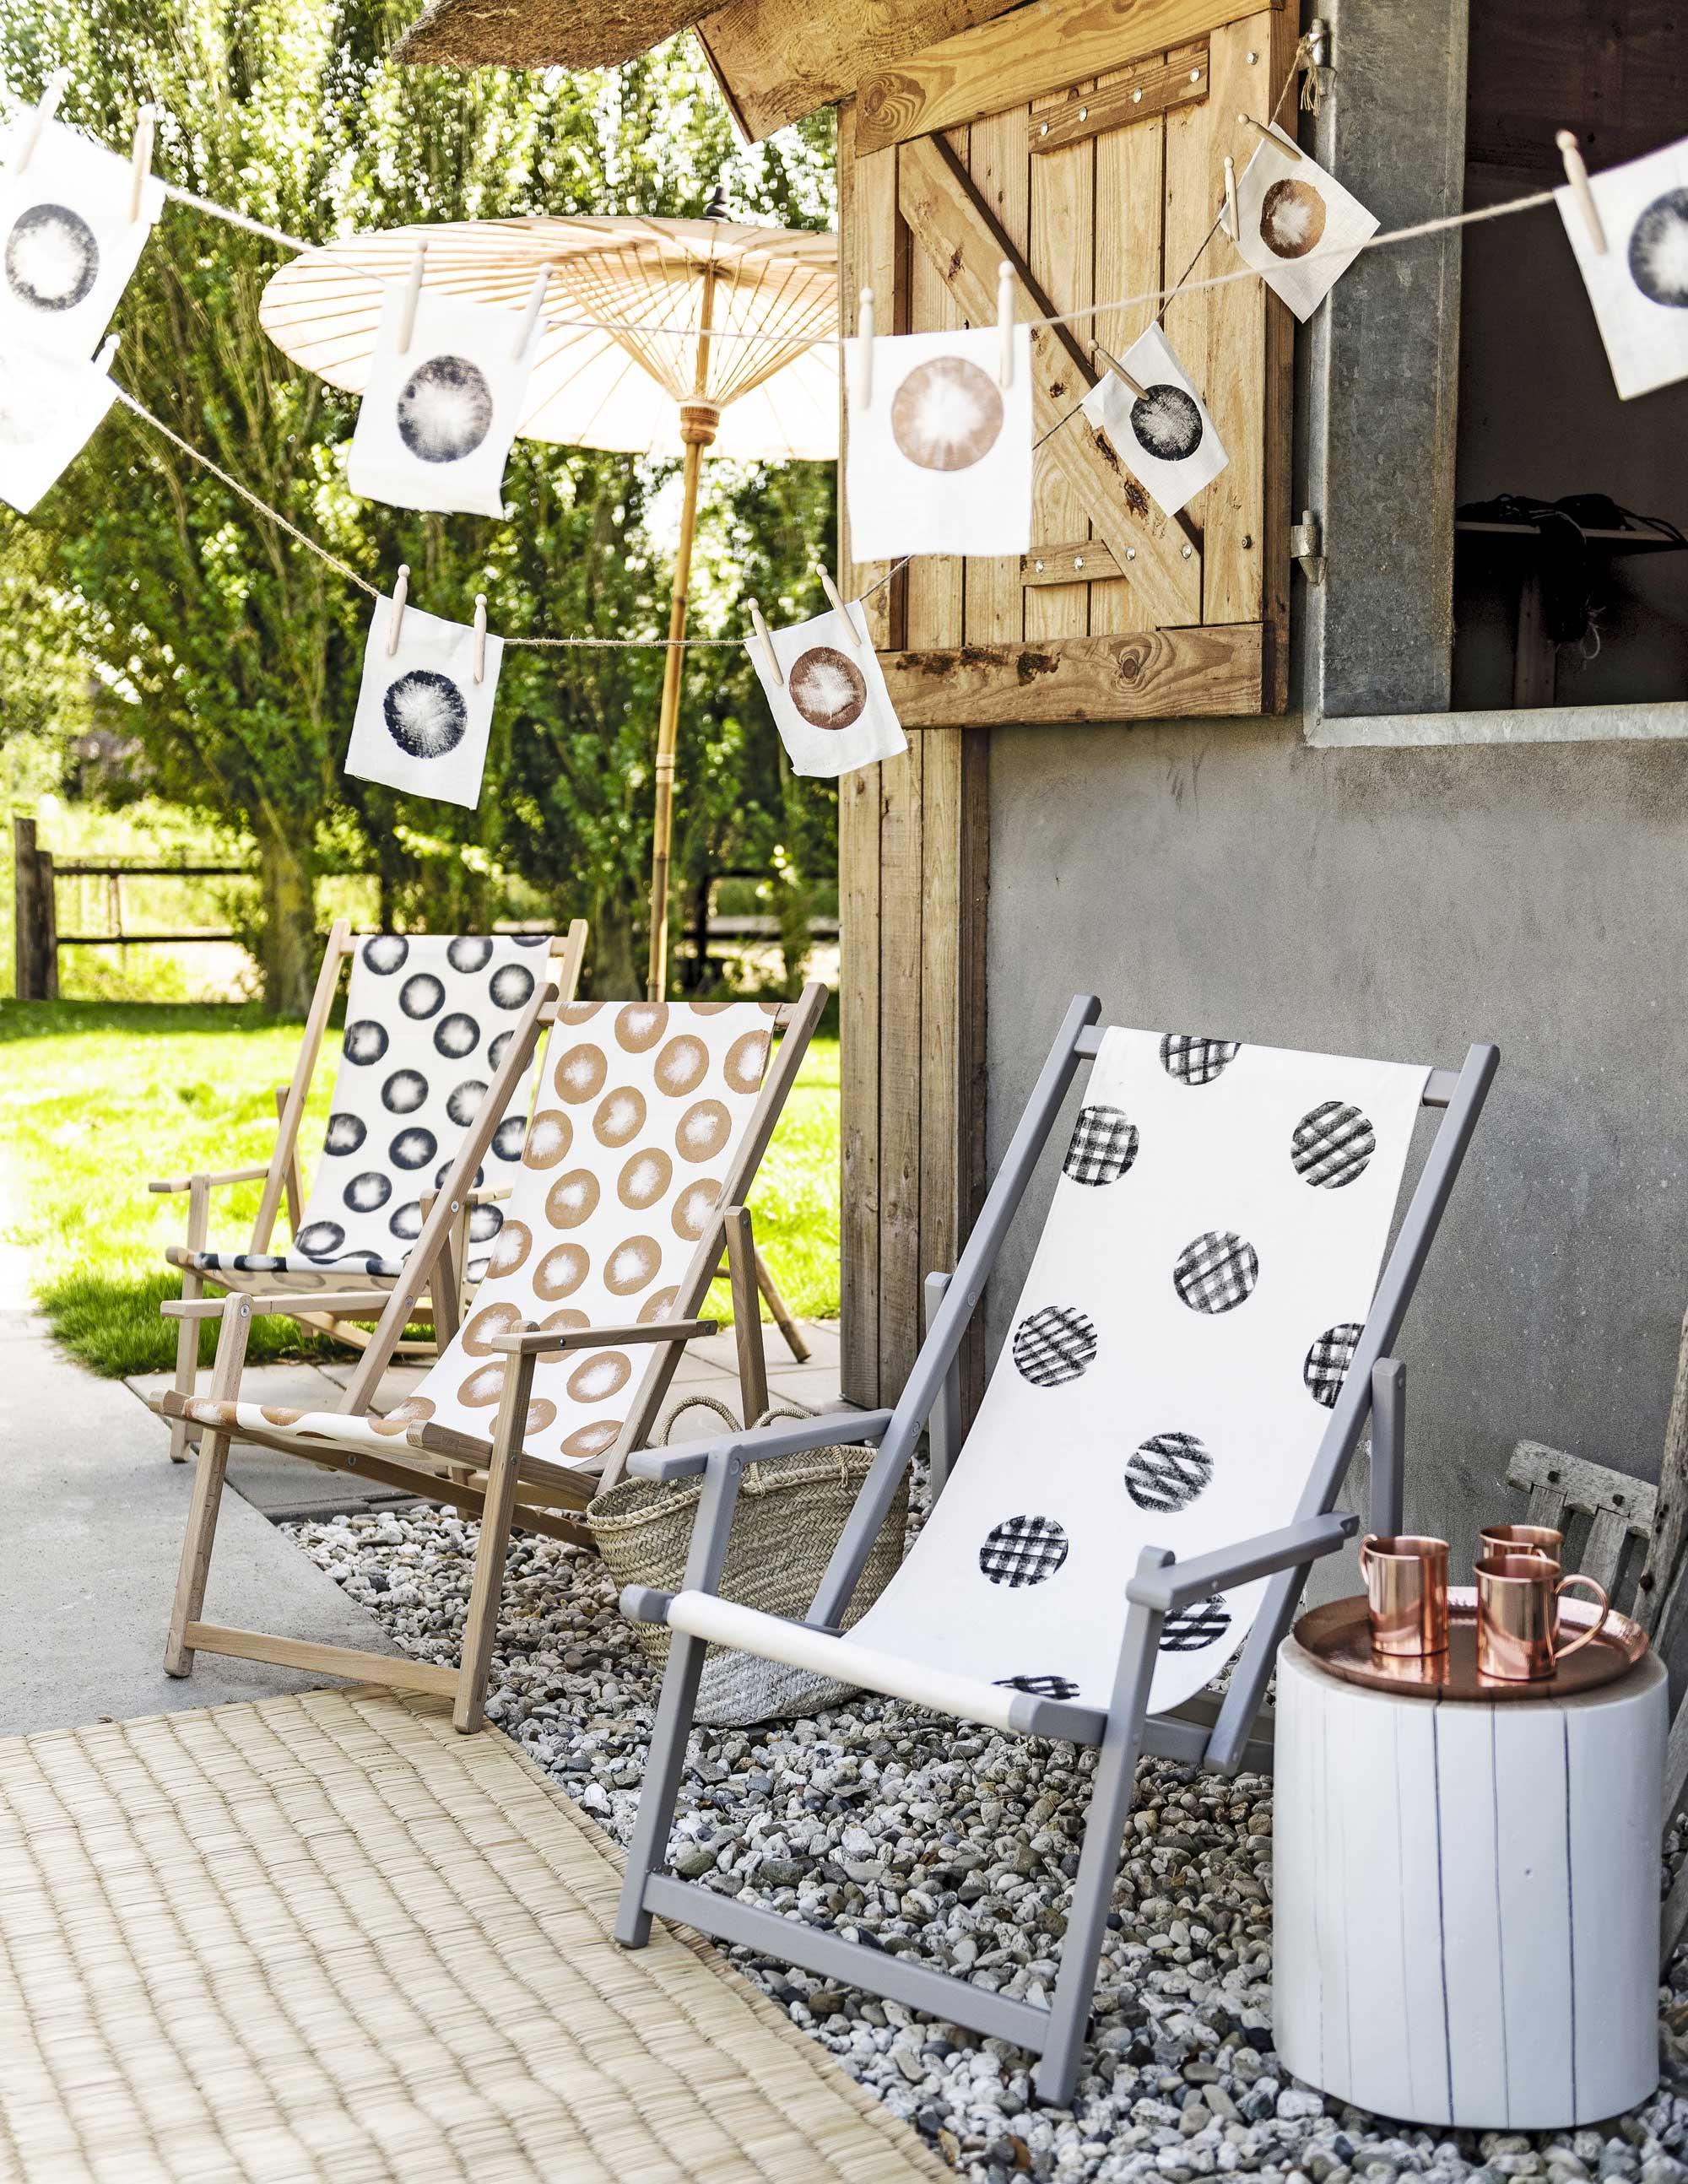 Buiten ♥ feest: DIY strandstoel en slinger | vtwonen